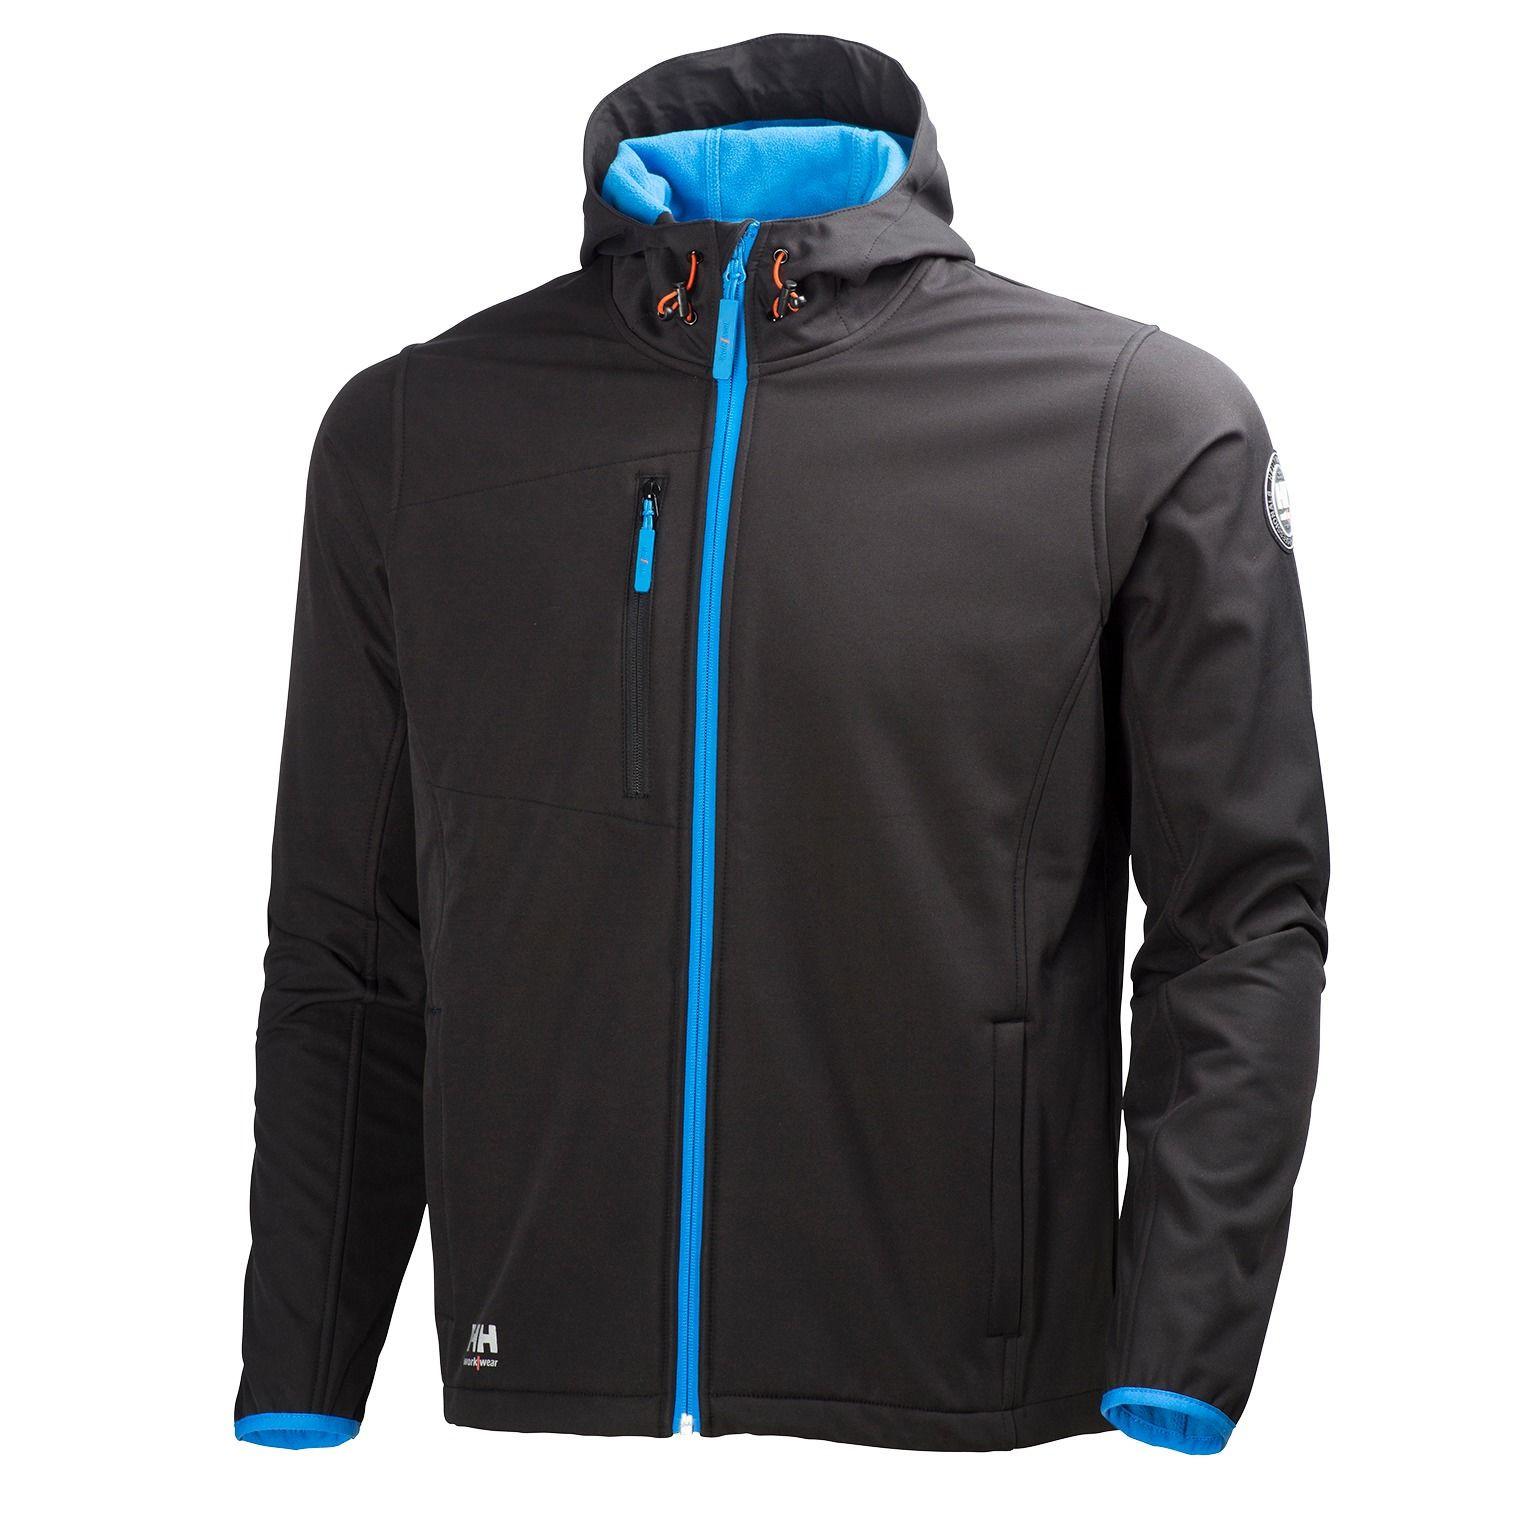 Куртка Helly Hansen Valencia Jacket - 74010